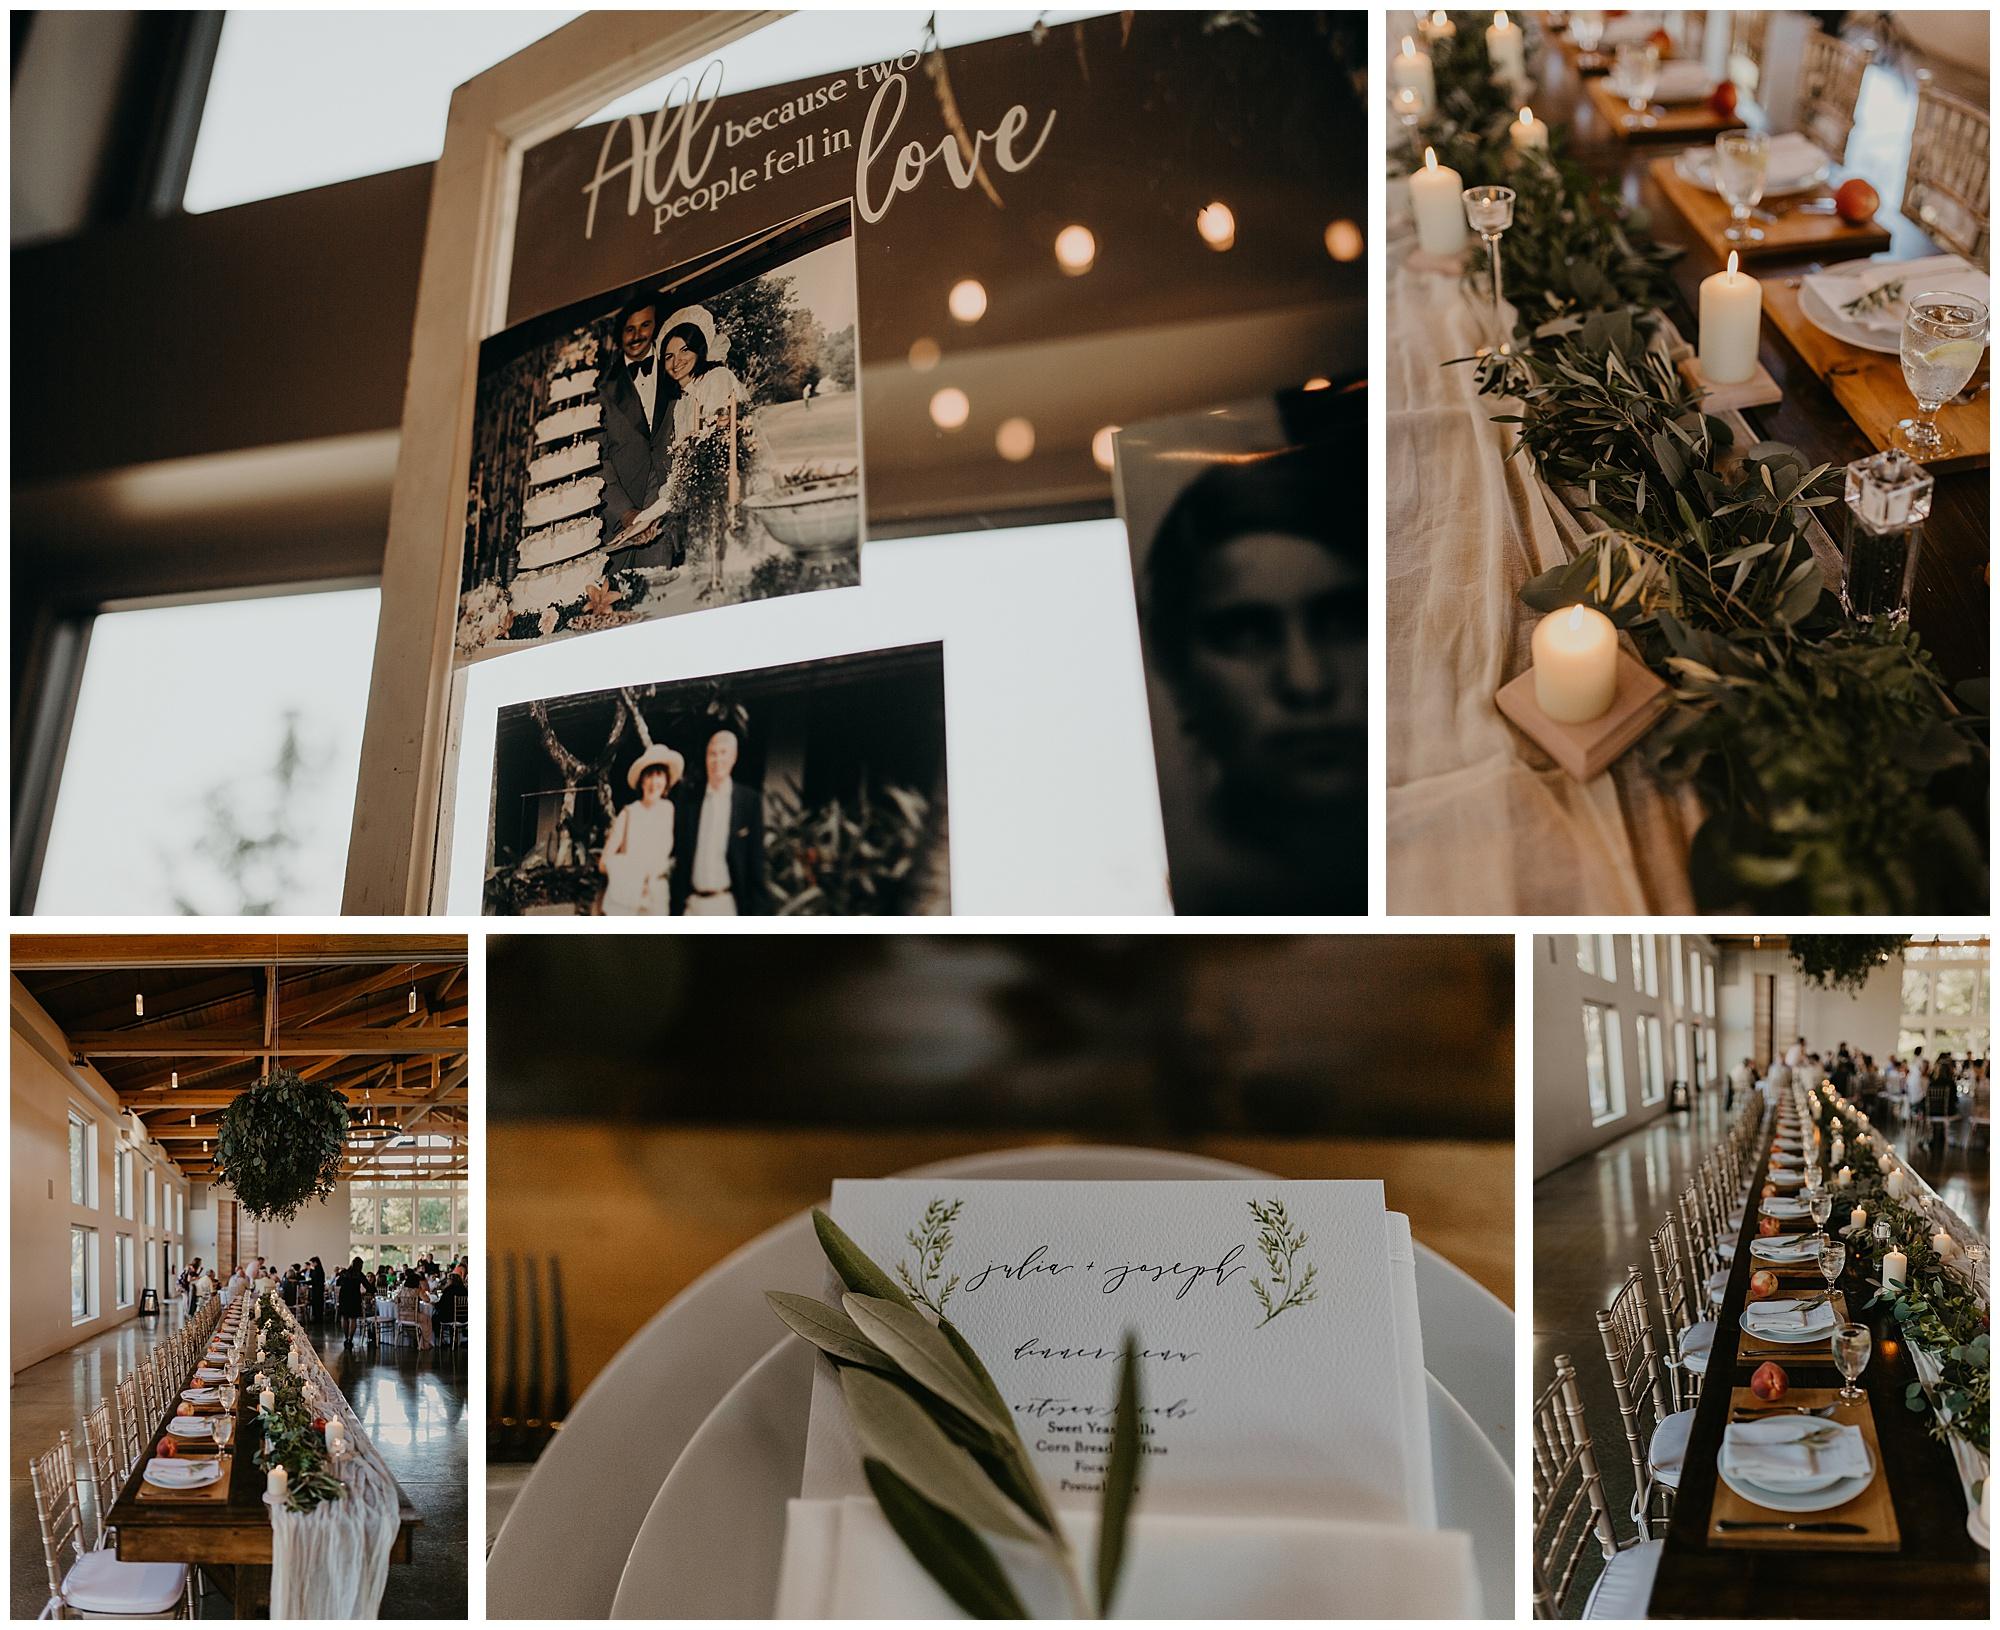 pear_tree_estate_wedding_champaign_il_wright_photographs_jj_0010.jpg